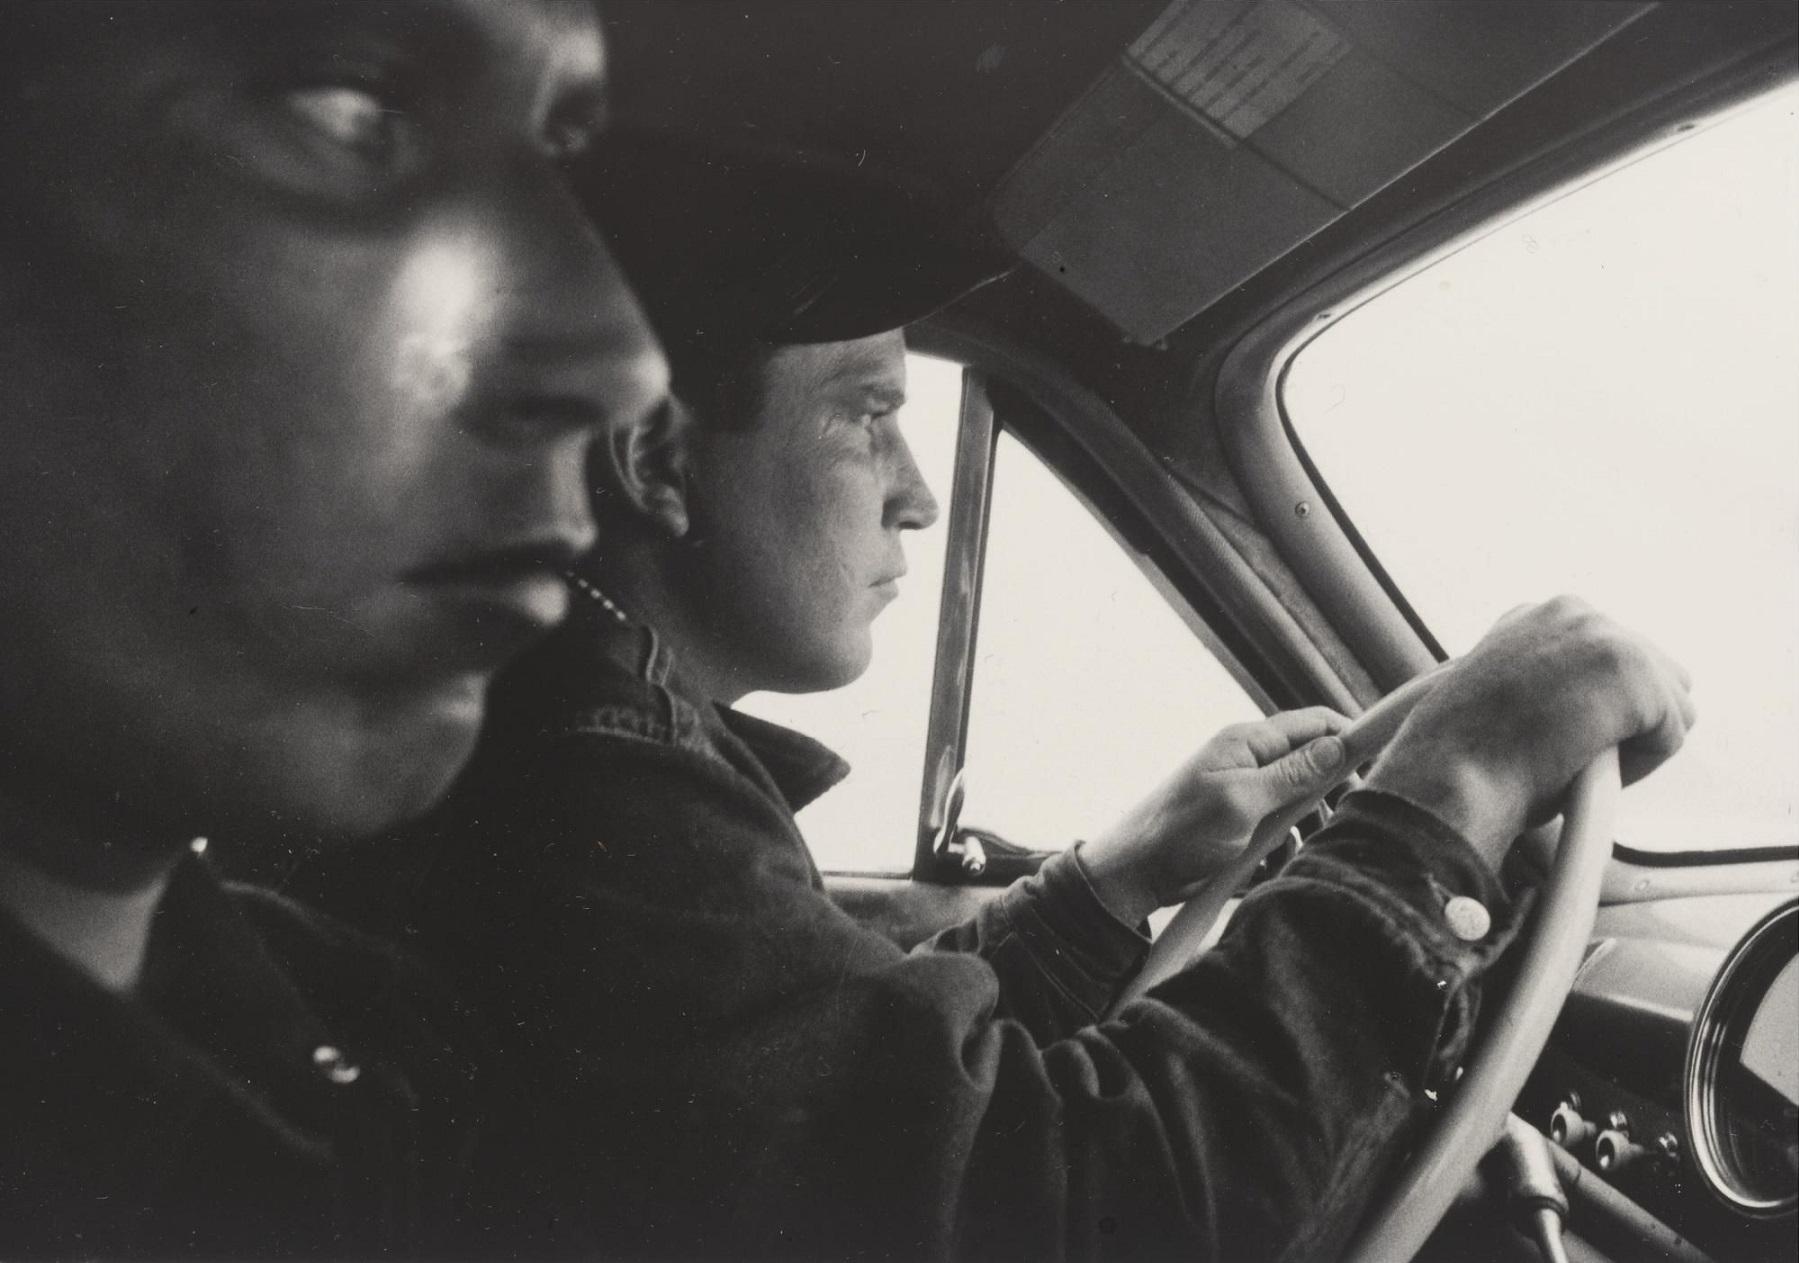 Hitchhikers leaving Blackfoot, Idaho towards Butte, Montana,  1956